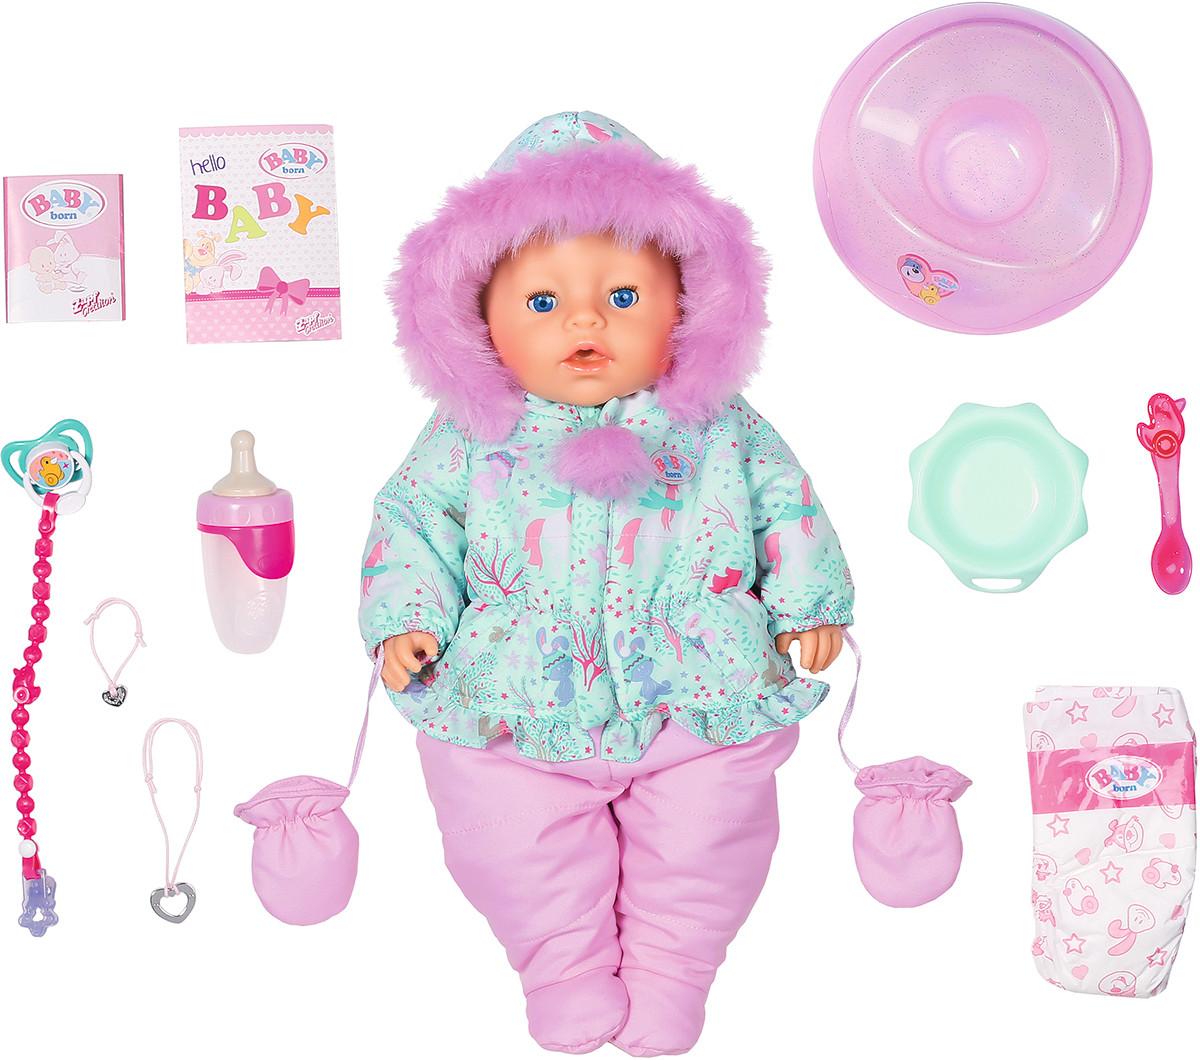 Кукла Zapf Baby Born Нежные объятия - Зимняя Красавица с аксессуарами 43 см (827529)